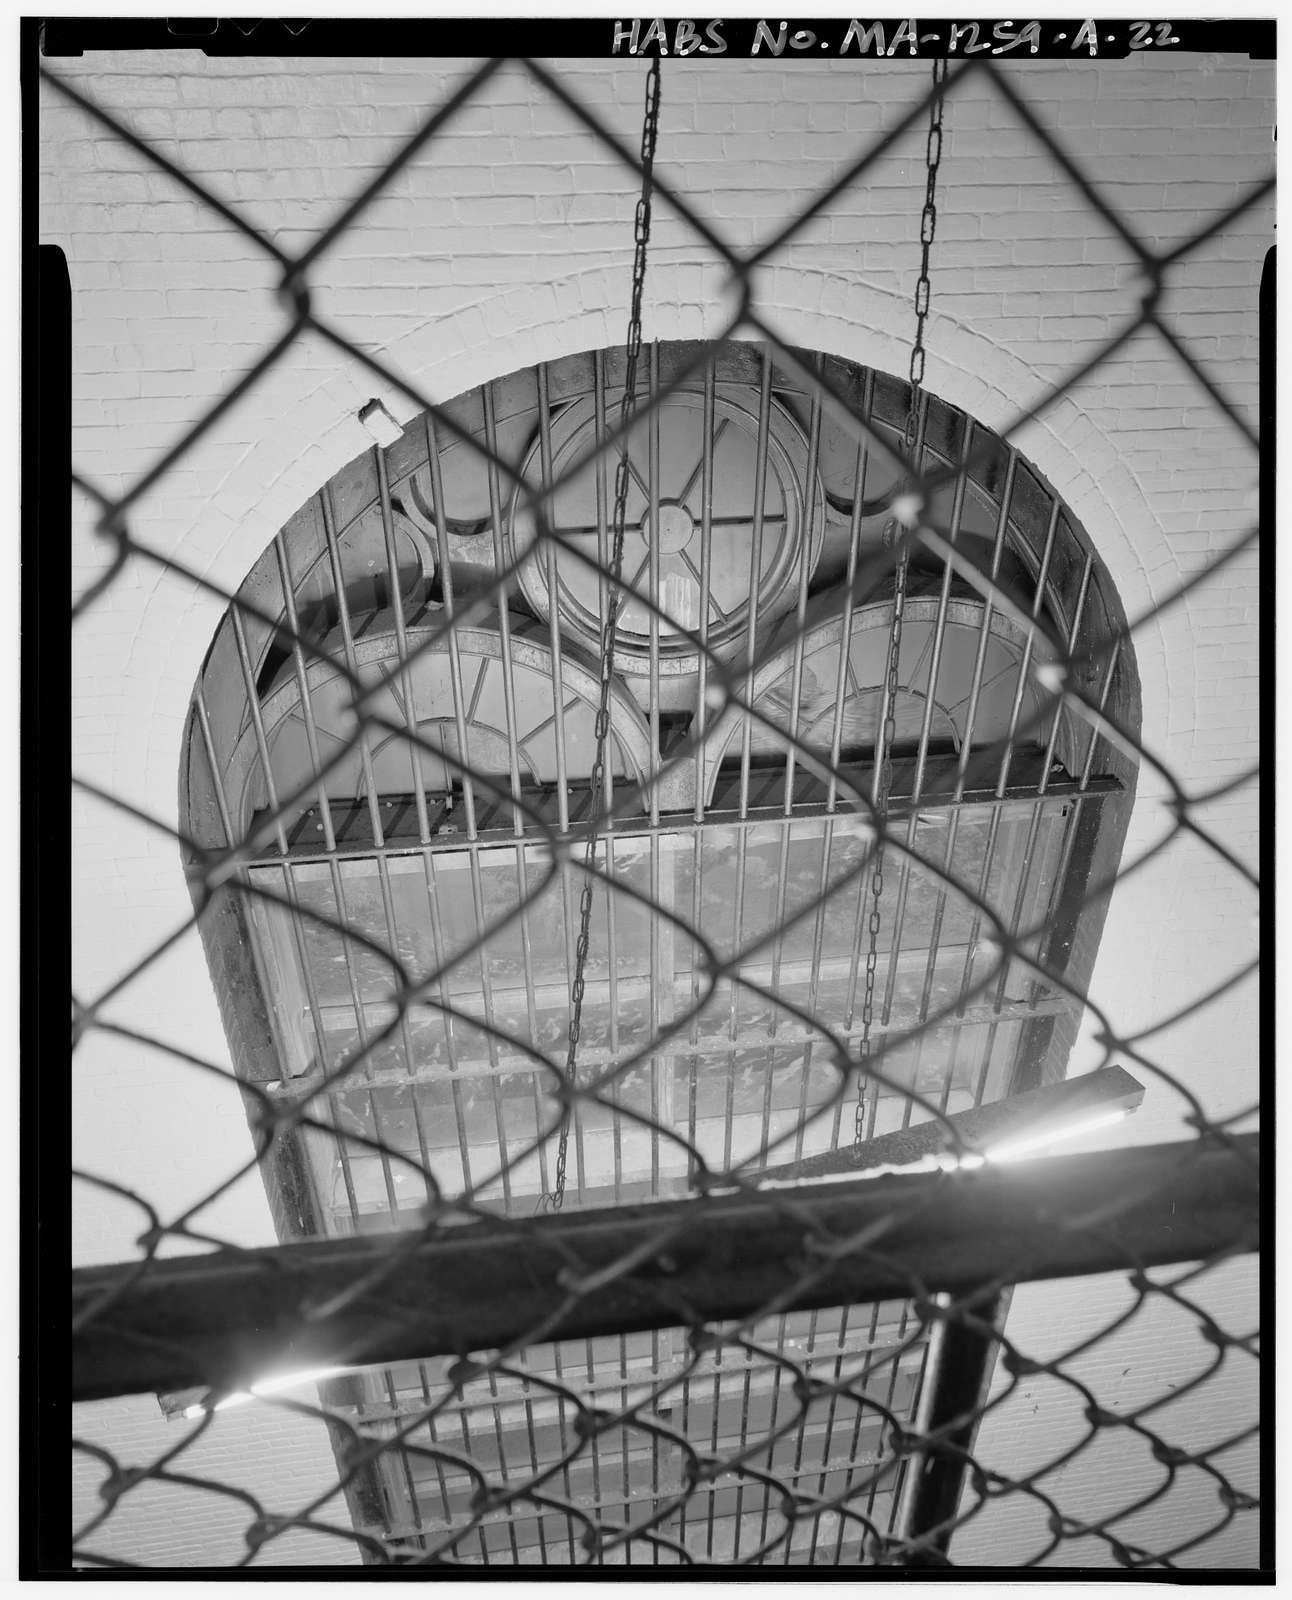 Charles Street Jail Complex, Jail, 215 Charles Street, Boston, Suffolk County, MA